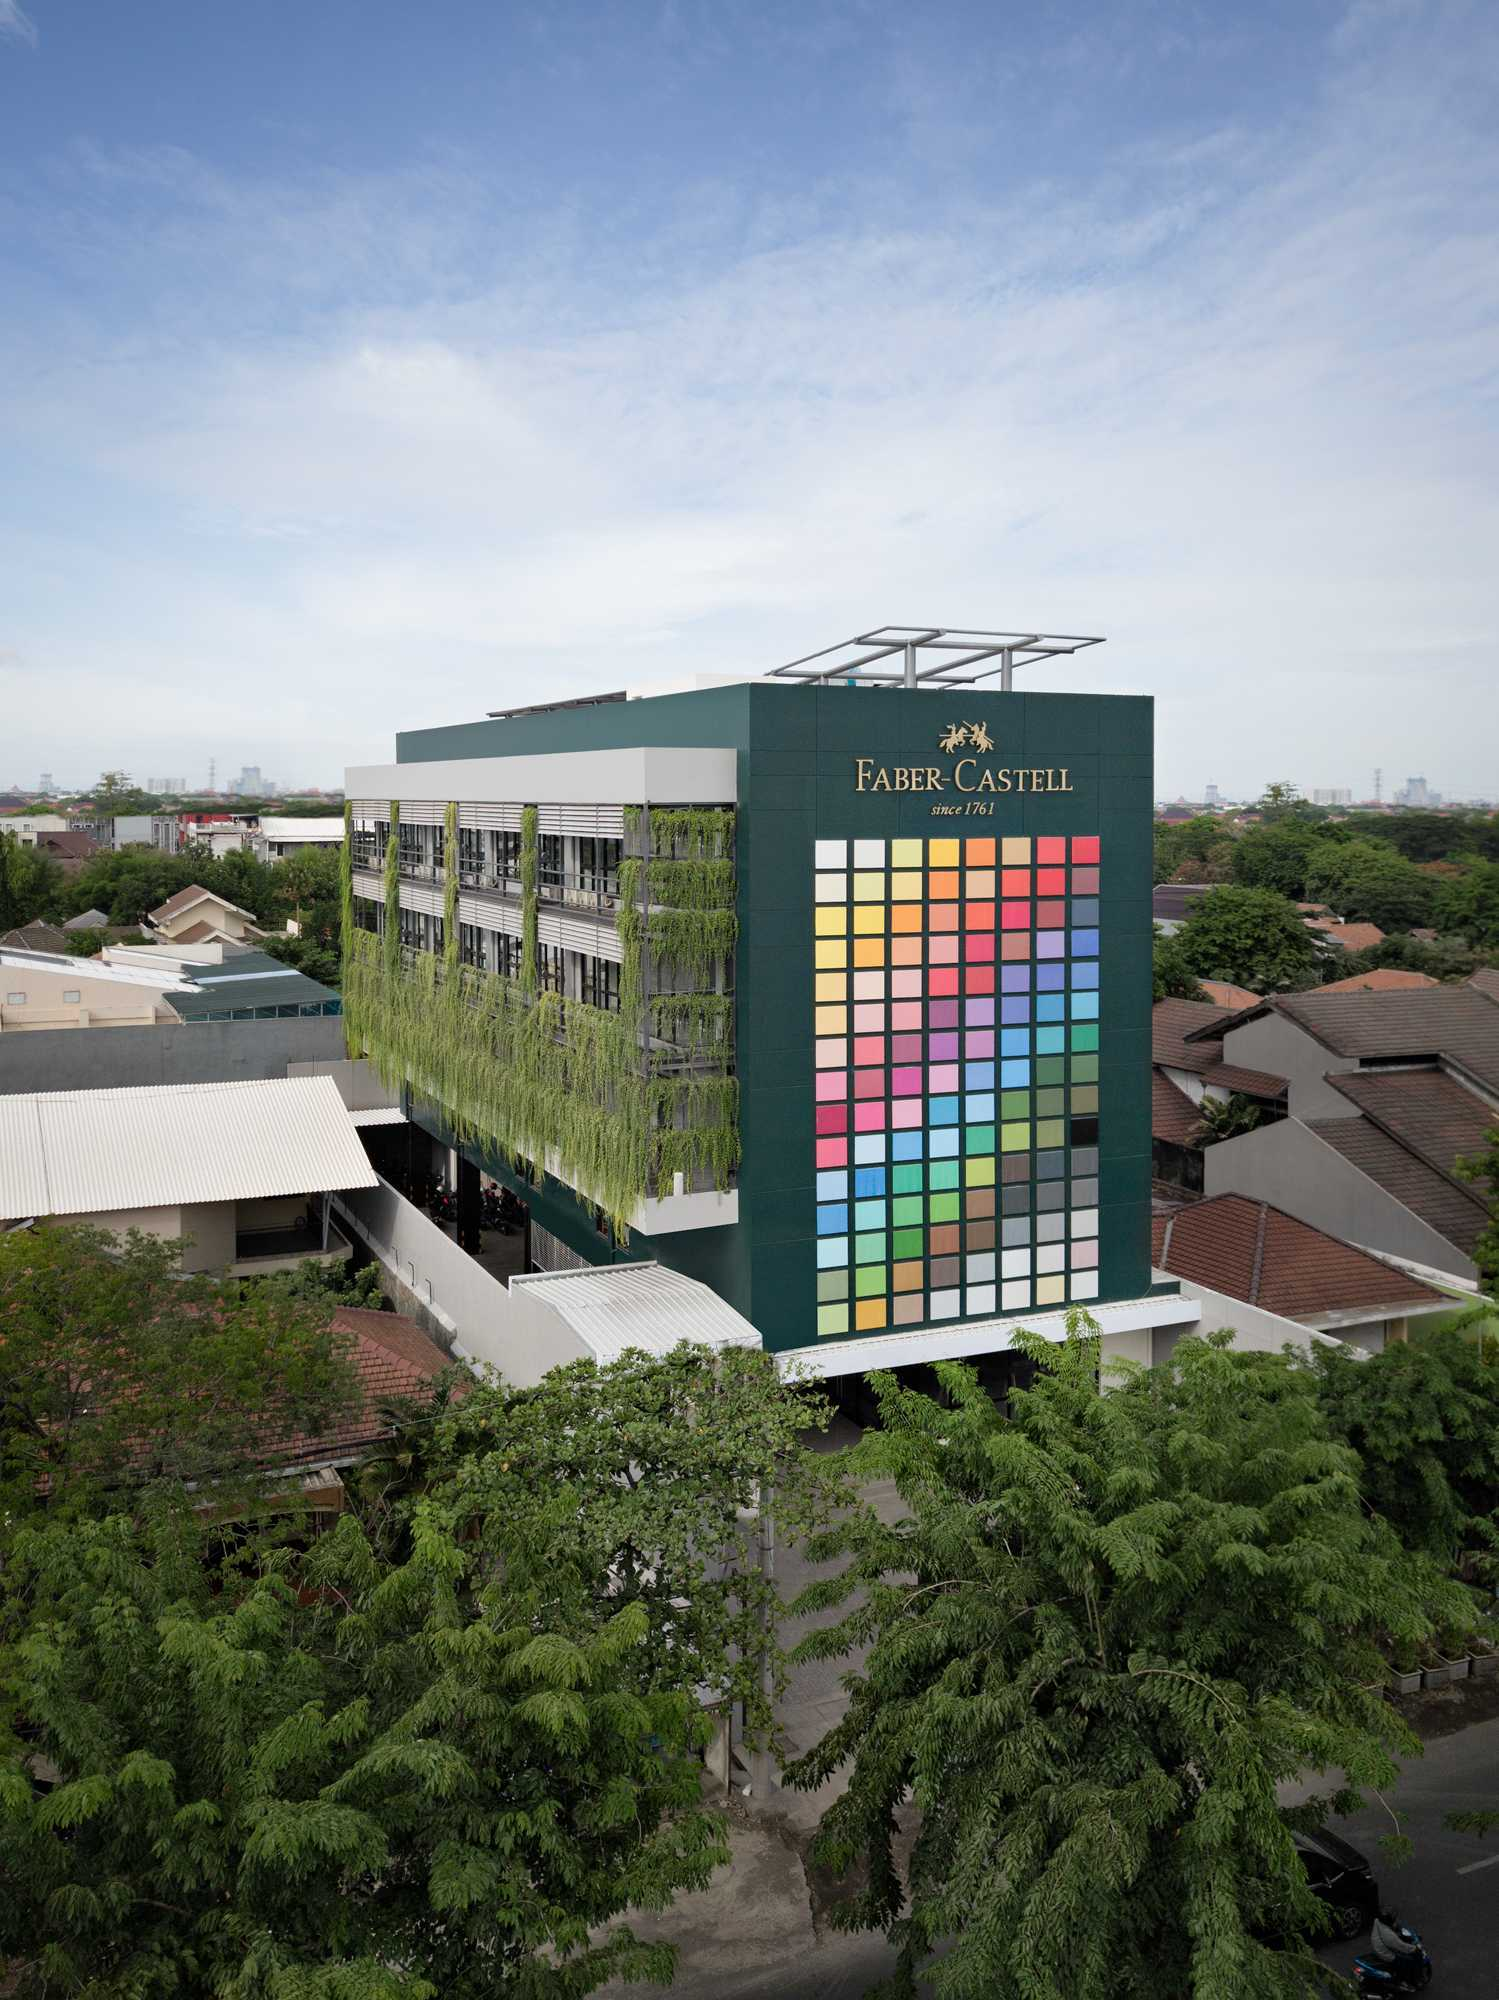 Best Group Design Studio Faber Castell International - Surabaya Surabaya, Kota Sby, Jawa Timur, Indonesia Surabaya, Kota Sby, Jawa Timur, Indonesia Best-Group-Design-Studio-Faber-Castell-International-Surabaya  88498